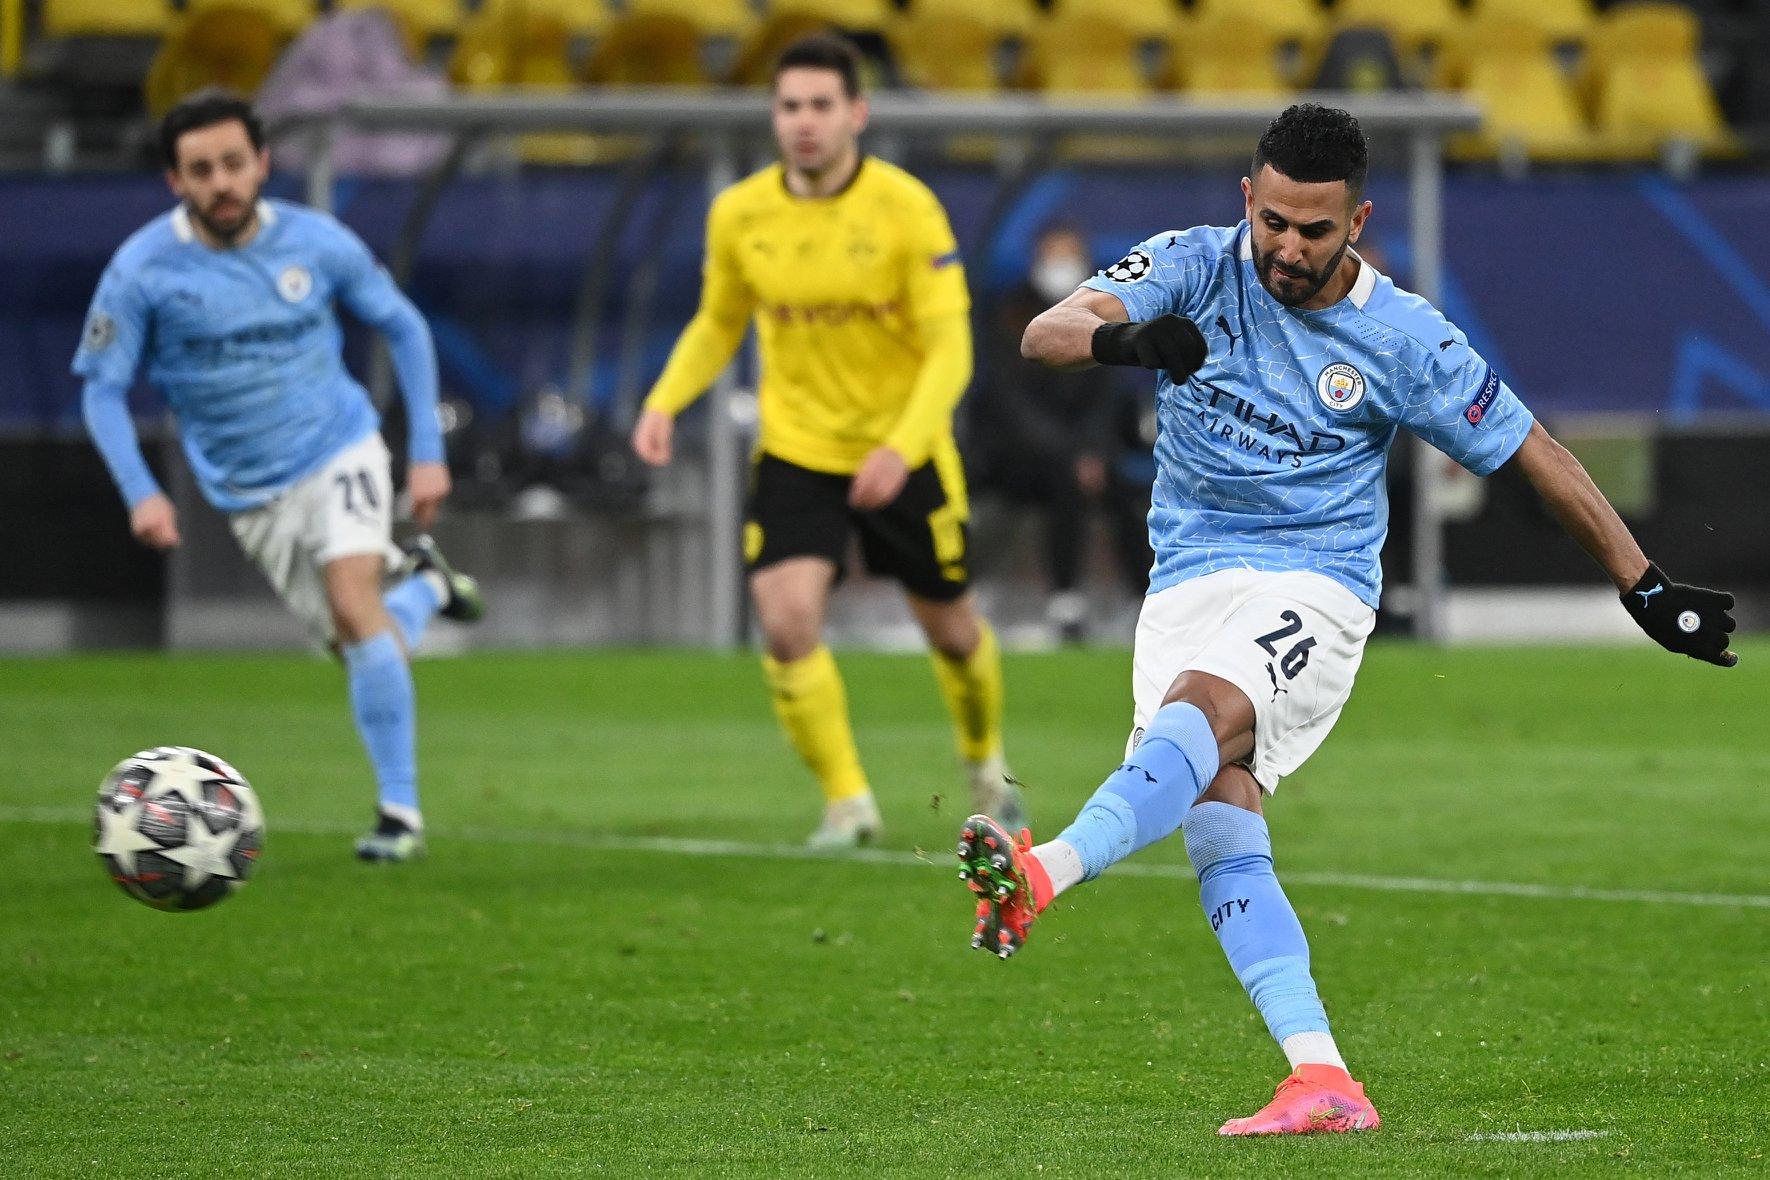 Manchester City end their quarterfinal curse under Pep Guardiola  - Bóng Đá